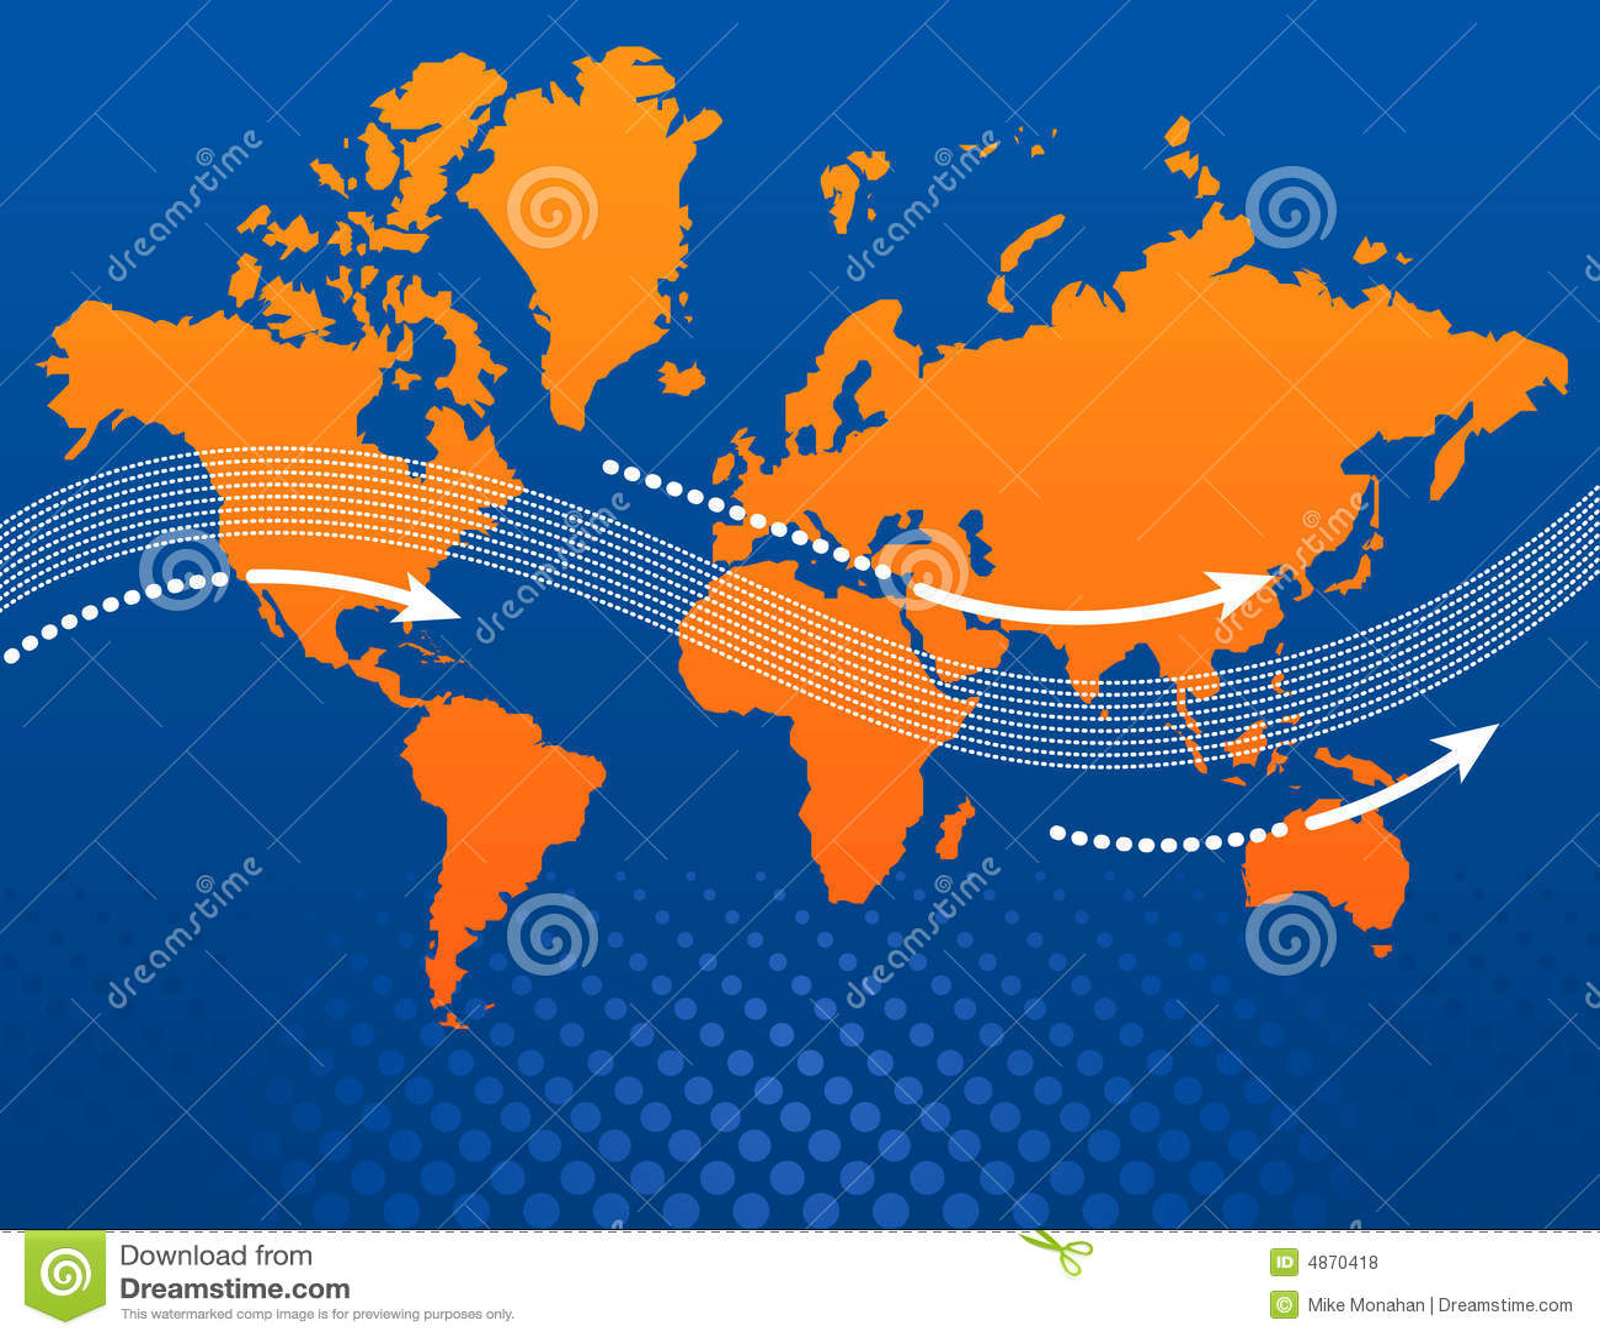 World map design royalty free stock photos image 4870418 for Map designer free